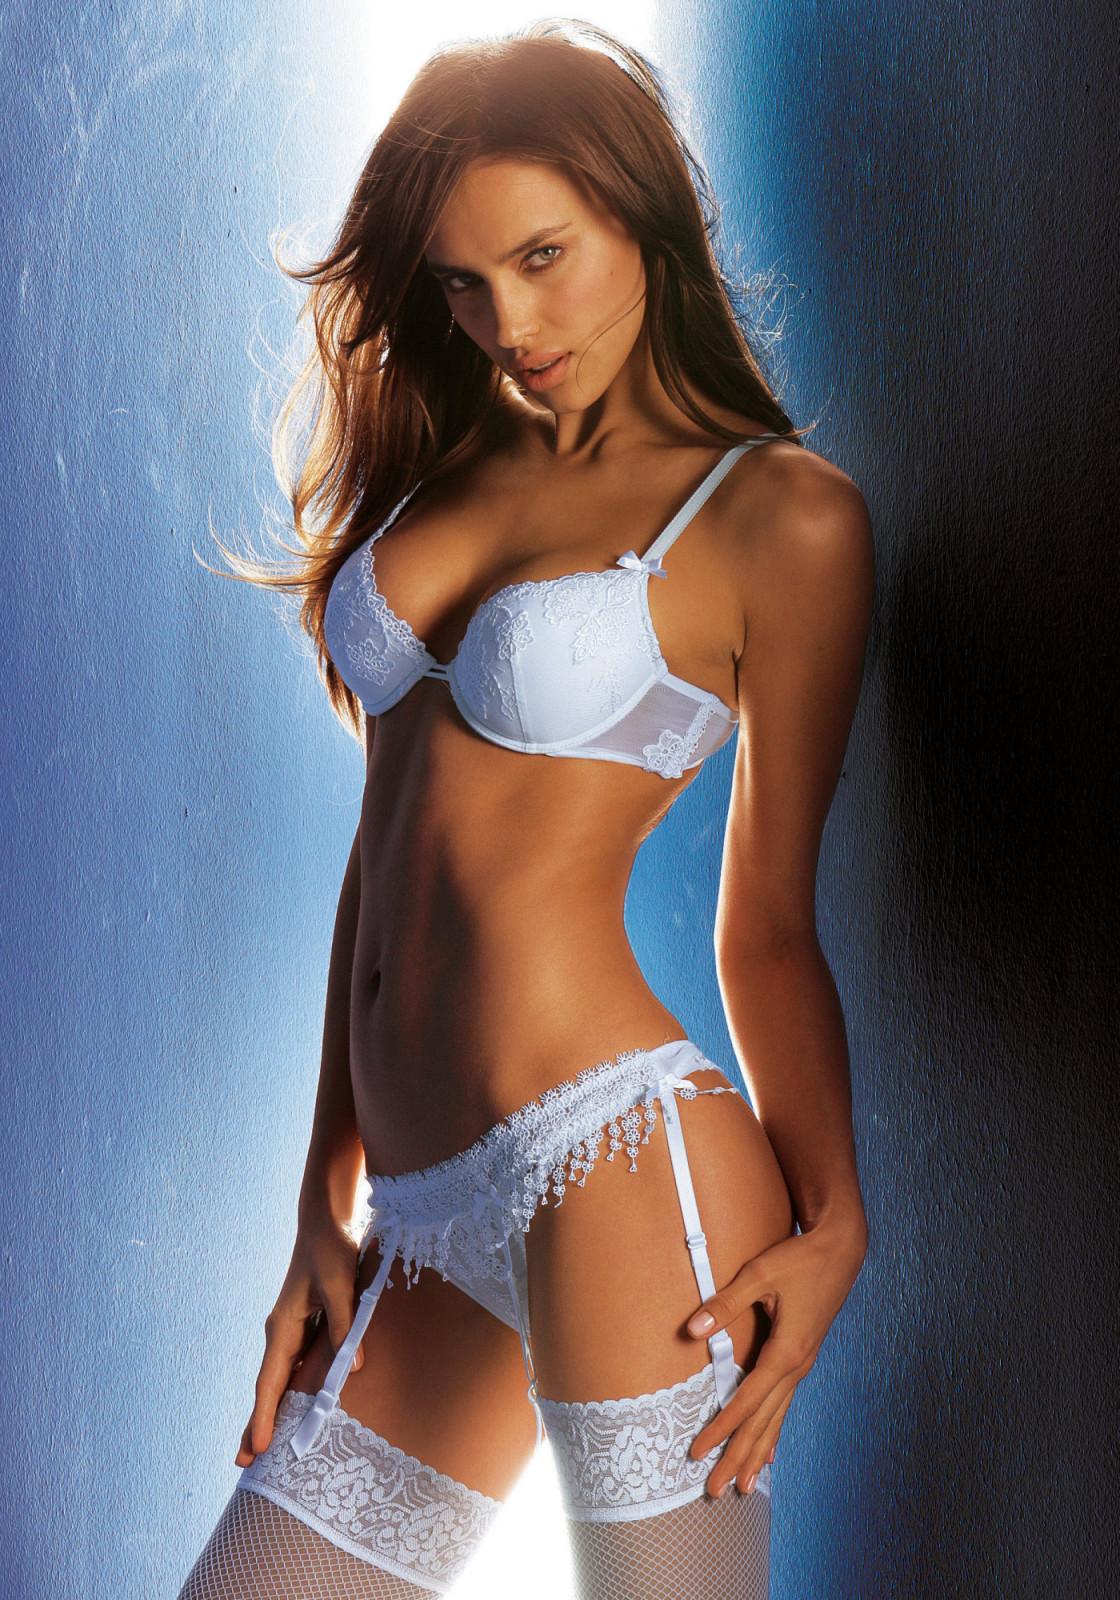 Irina Sheik photo 242 ... Bradley Cooper Md